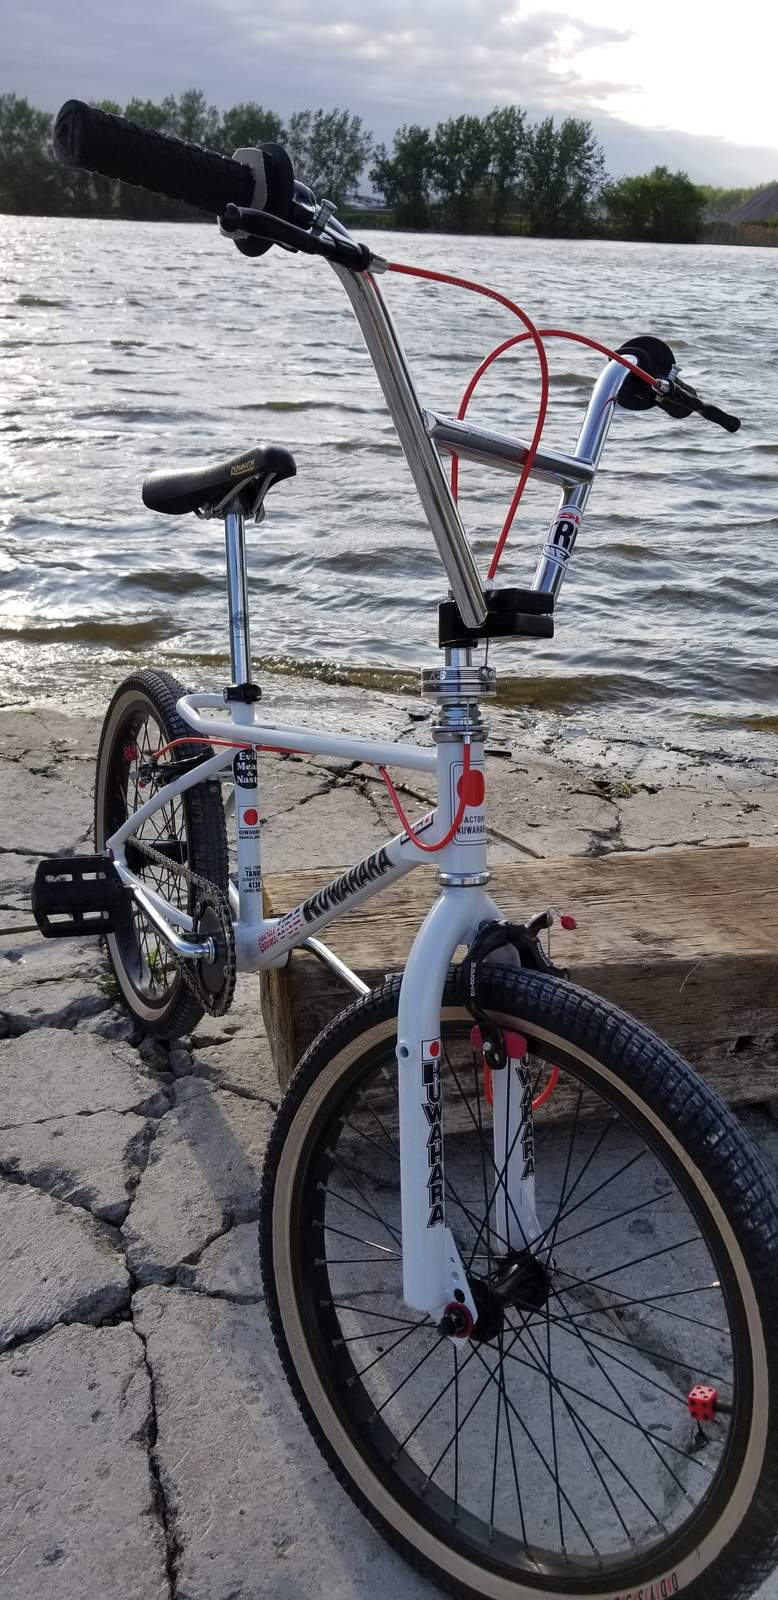 ODYSSEY BMX BIKE EVO 2.5 BICYCLE U-BRAKE KIT HOT PINK EVOLVER PRIMO SHADOW